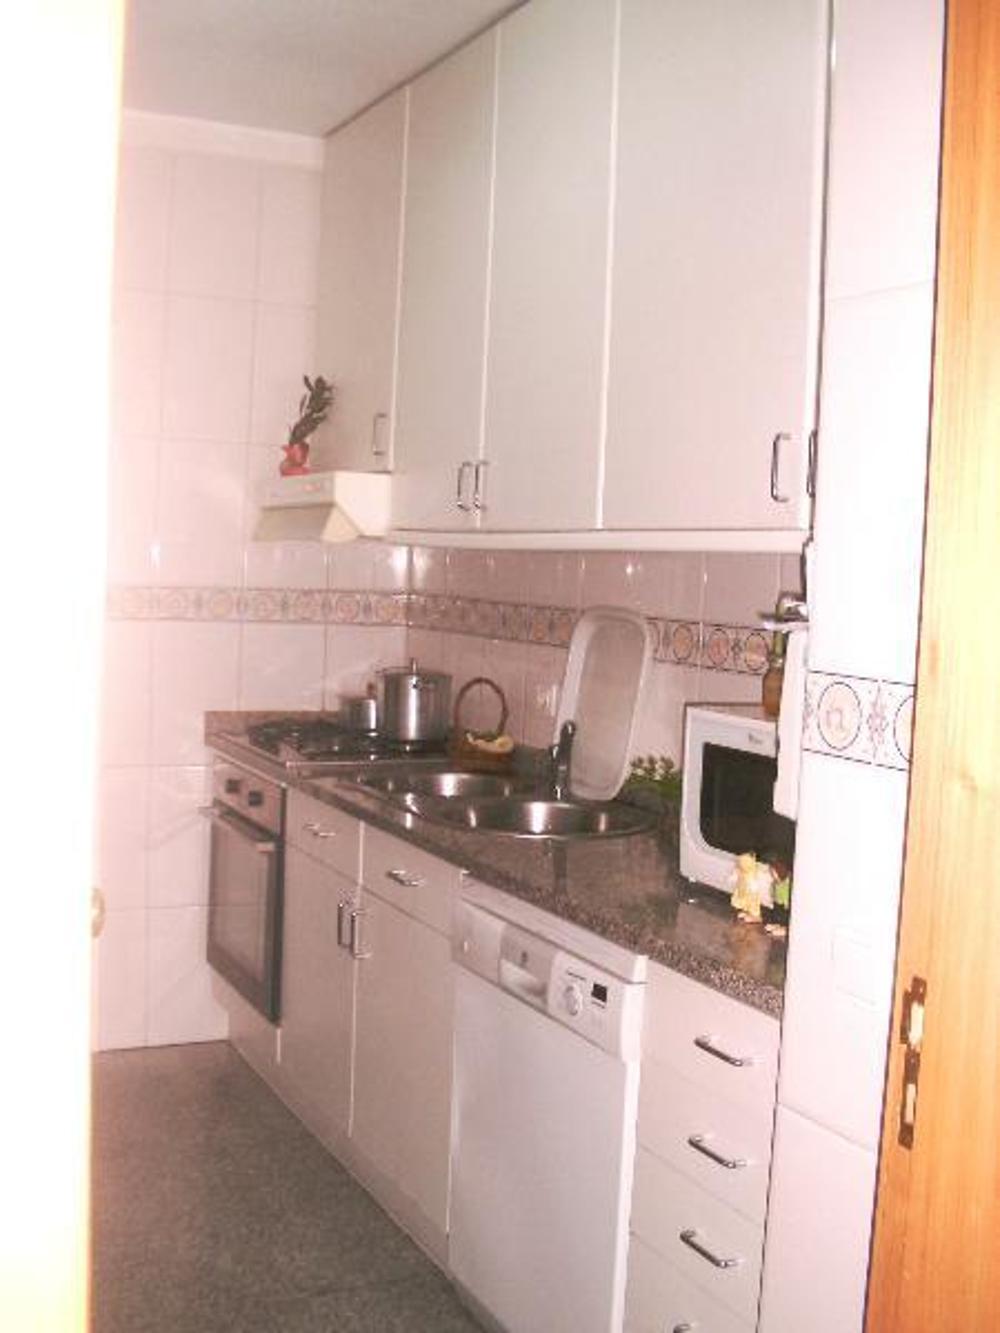 Valongo Valongo Apartment Bild 13035